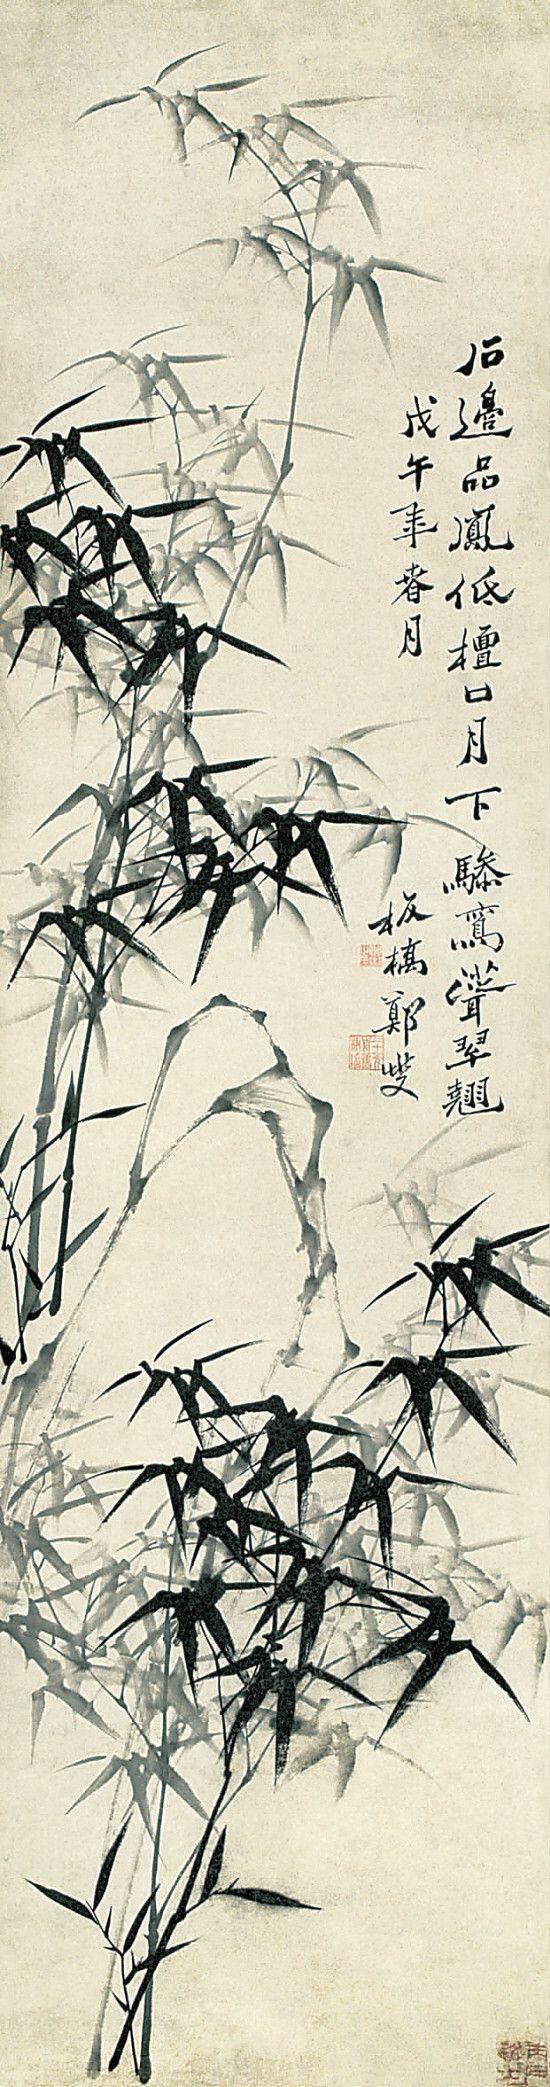 清代 - 鄭燮 - 竹石圖                      Zheng Xie (1693–1765), commonly known as Zheng Banqiao (鄭板橋) was a Chinese painter from Jiangsu.: